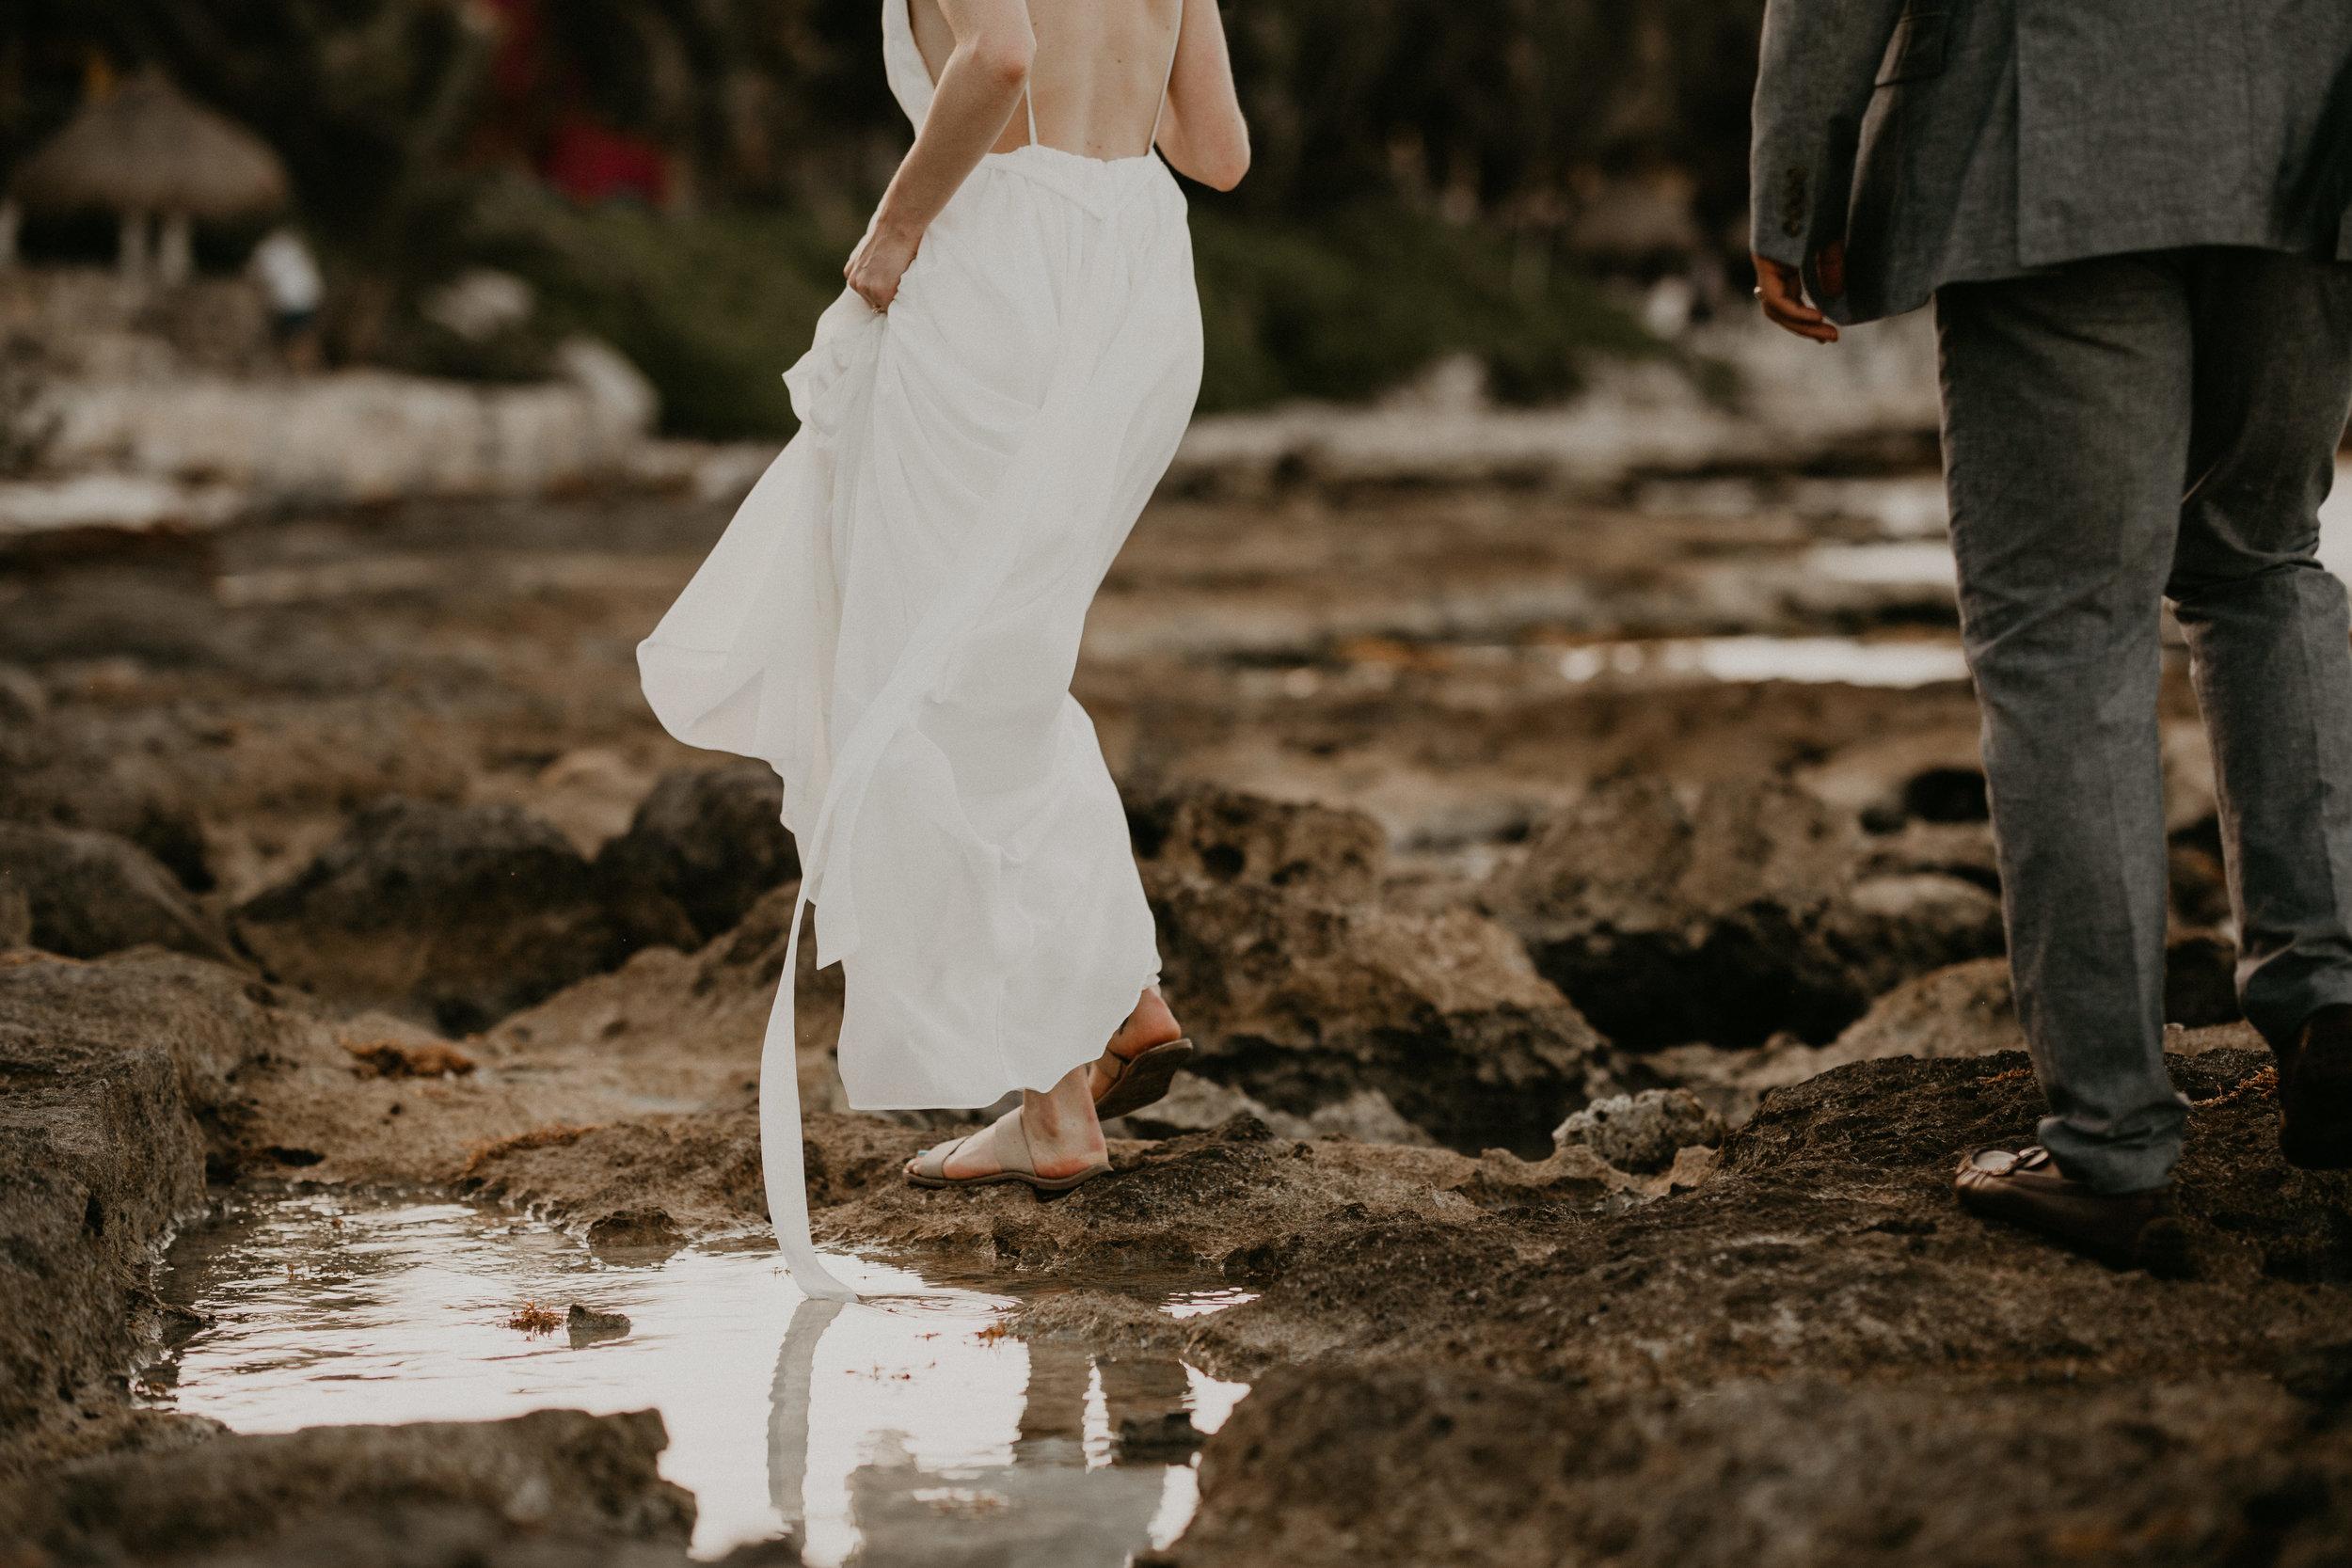 Nicole-Daacke-Photography-beachfront-akumal-destionation-wedding-tulum-mexico-elopement-photographer-destination-wedding-inspiration-sunset-champagne-pop-boho-bride-ocean-tropical-bohemian-tulum-wedding-photos-192.jpg